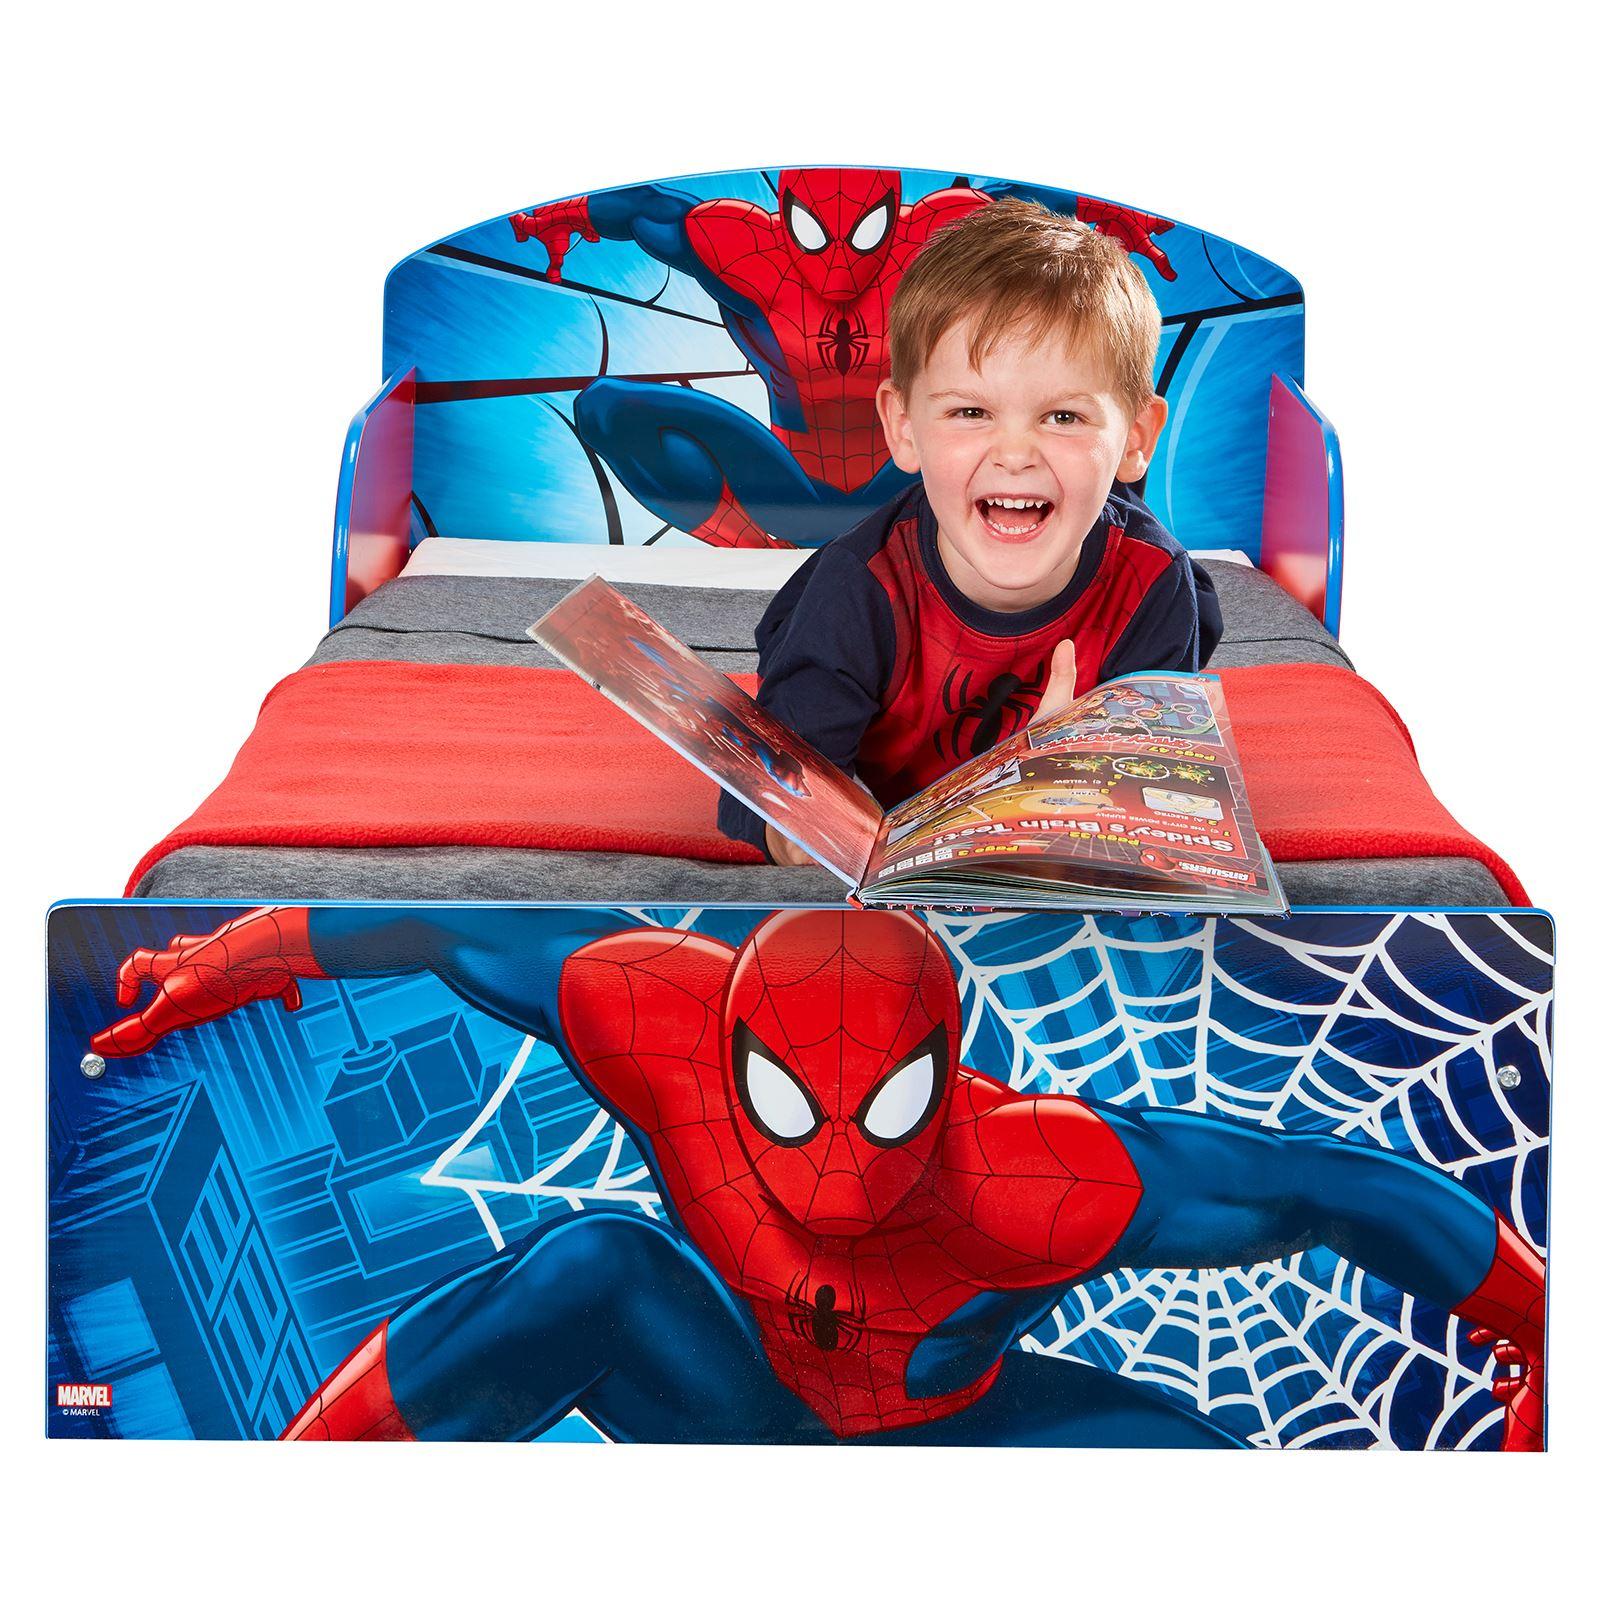 miniatura 45 - KIDS CHARACTER TODDLER BEDS - BOYS GIRLS BEDROOM DISNEY